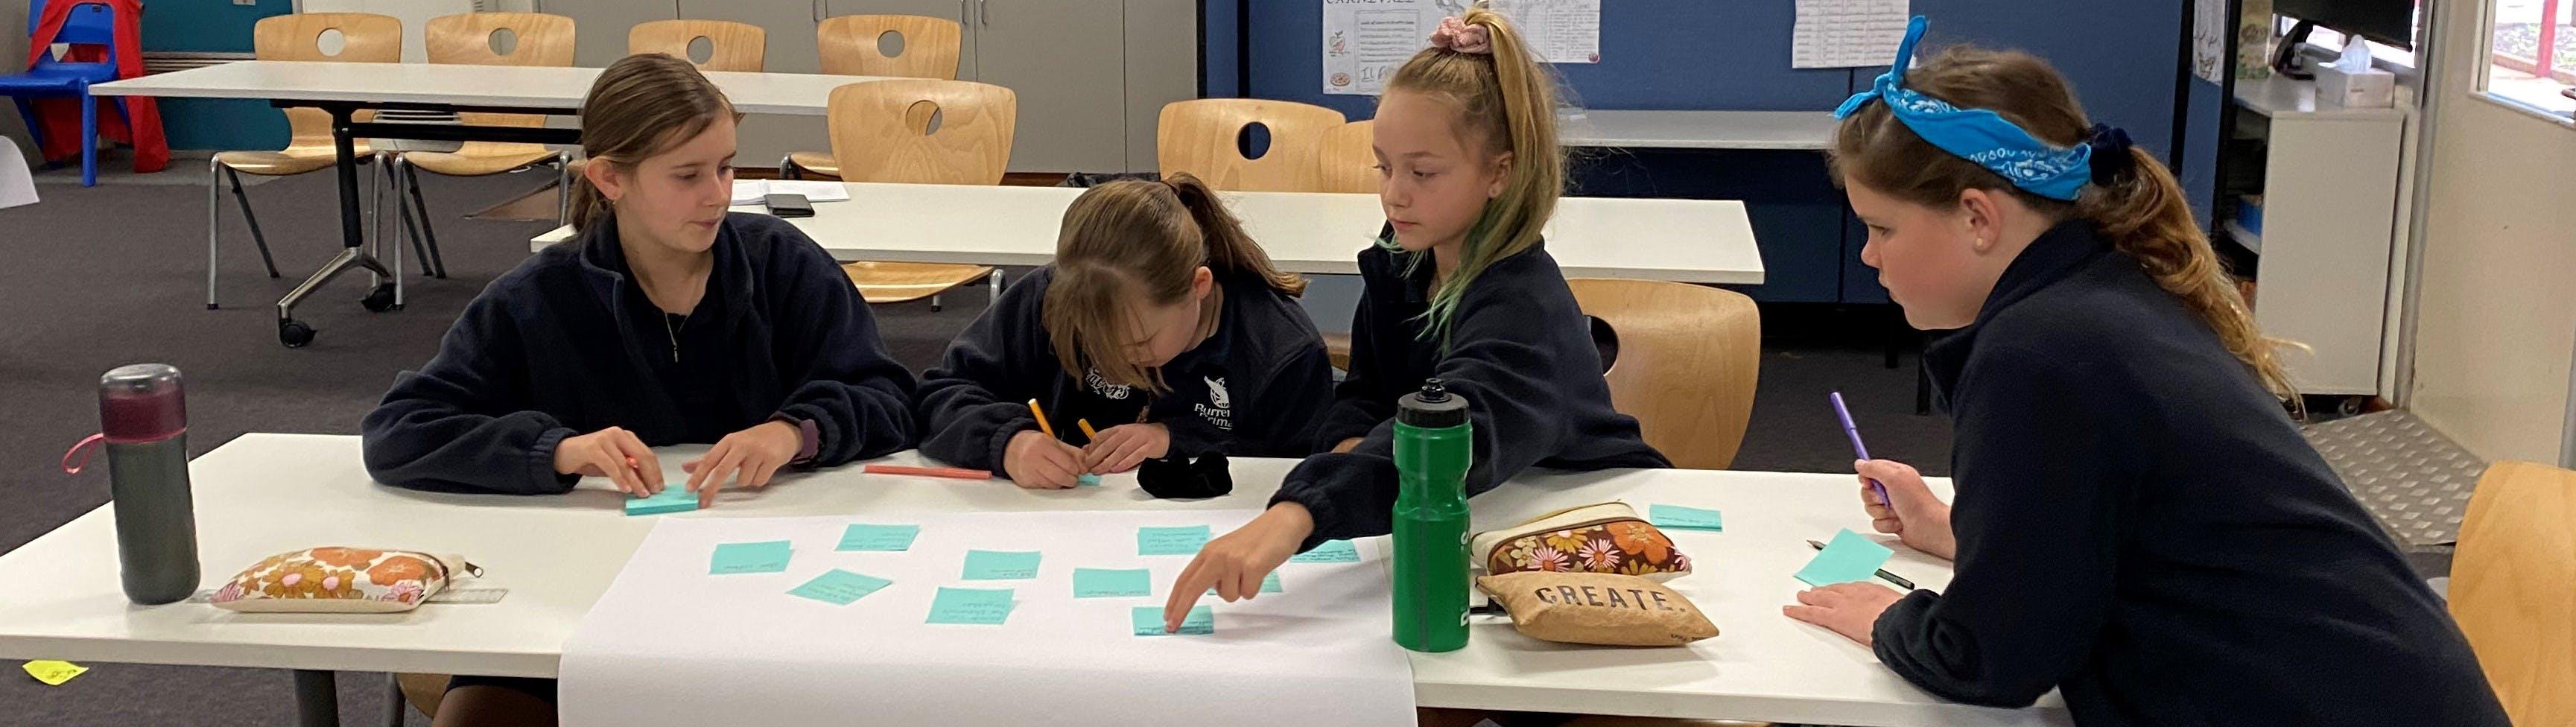 HICC Story Threads Conversation in Focus Burrandah Primary School.jpg